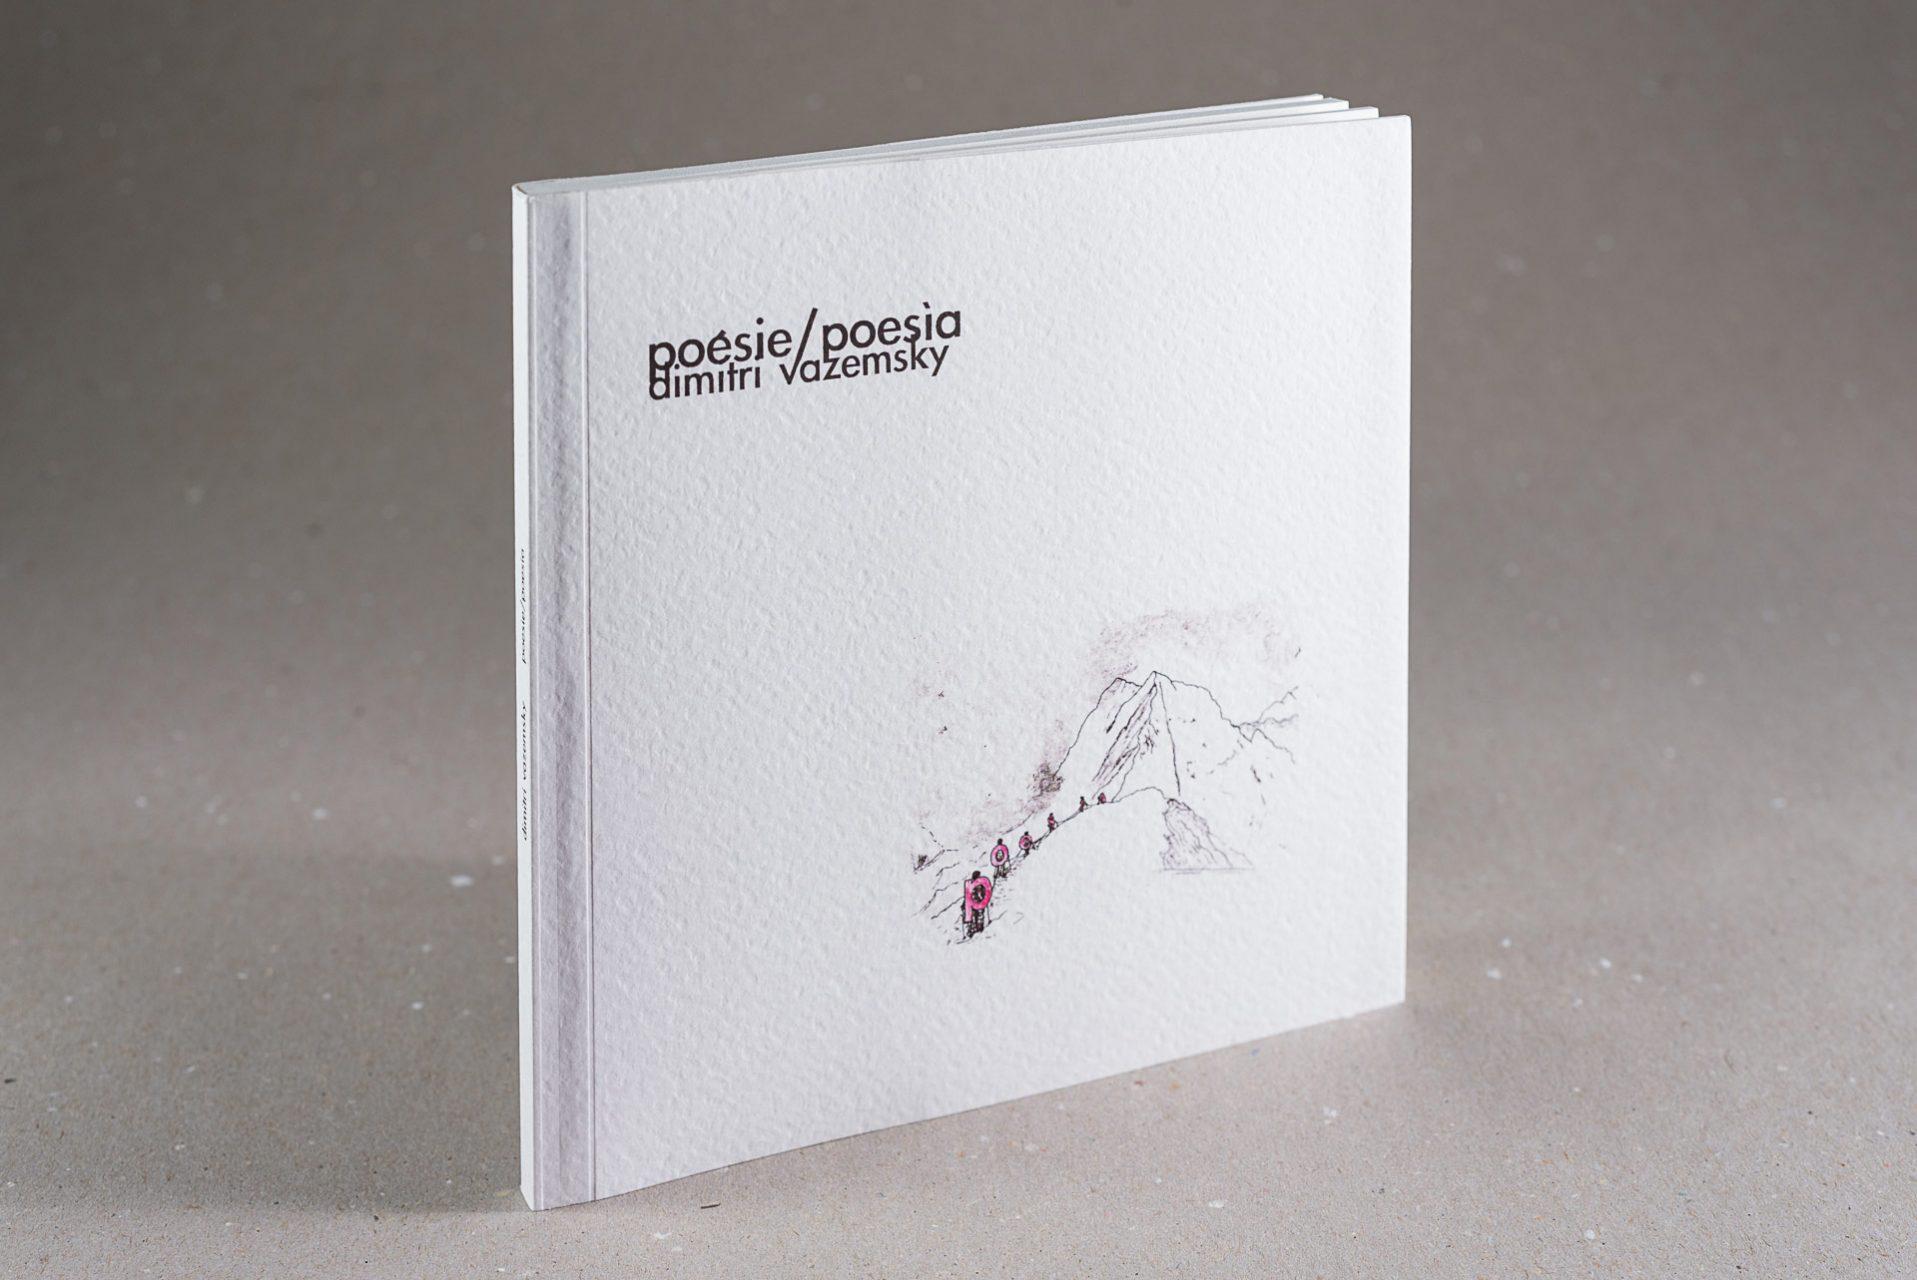 web-hd-nuit-myrtide-livre-poesie-poesia-dimitri-vazemsky-01